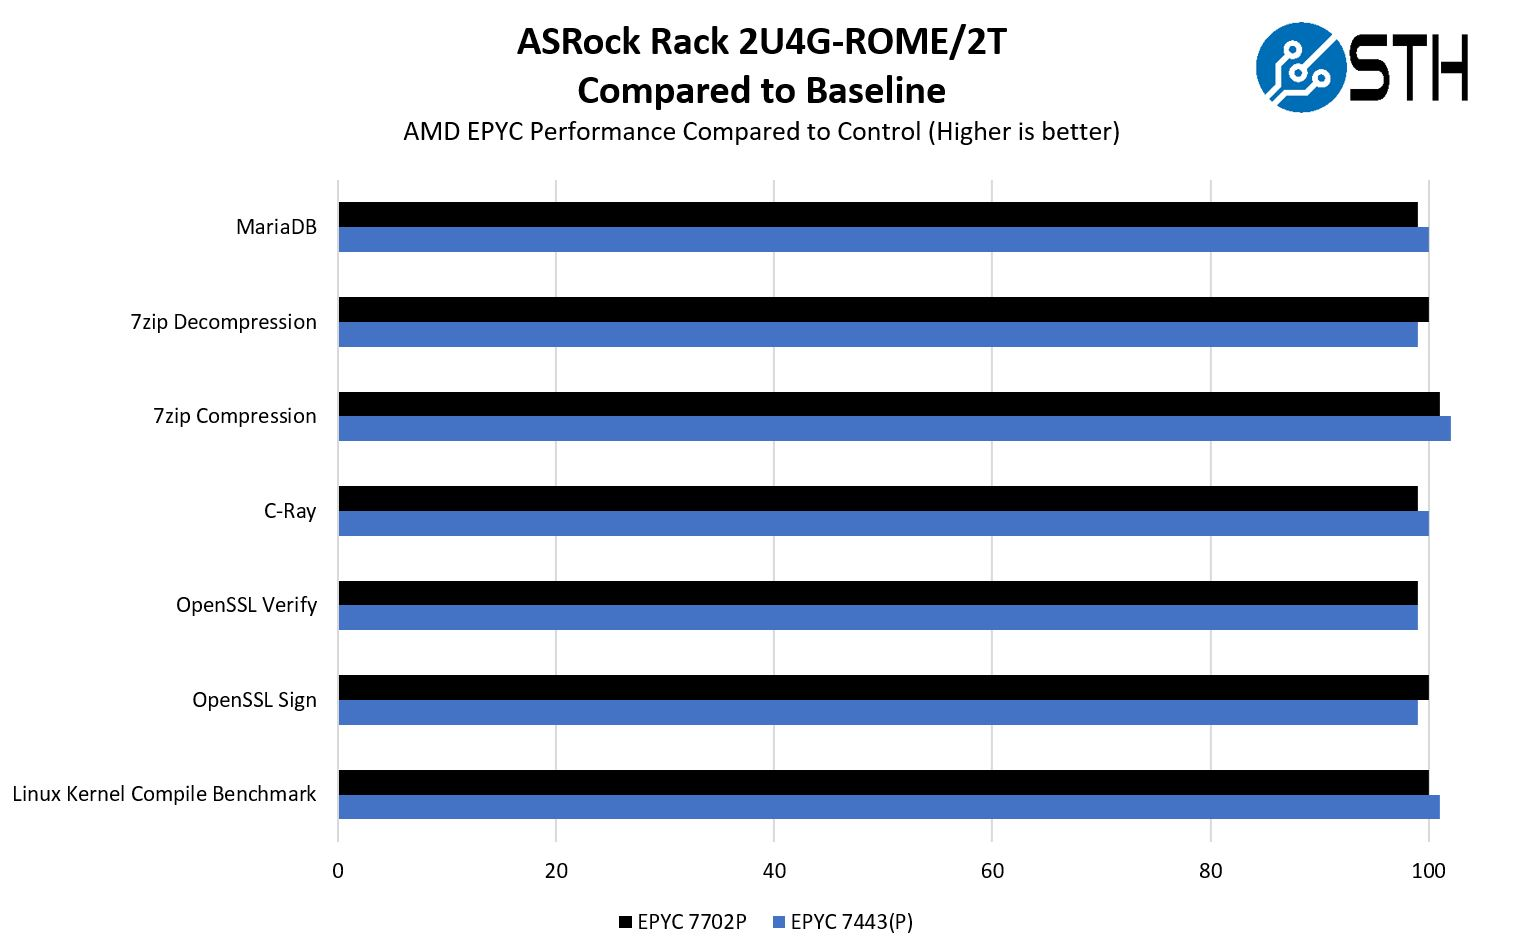 ASRock Rack 2U4G ROME 2T CPU Performance To Baseline